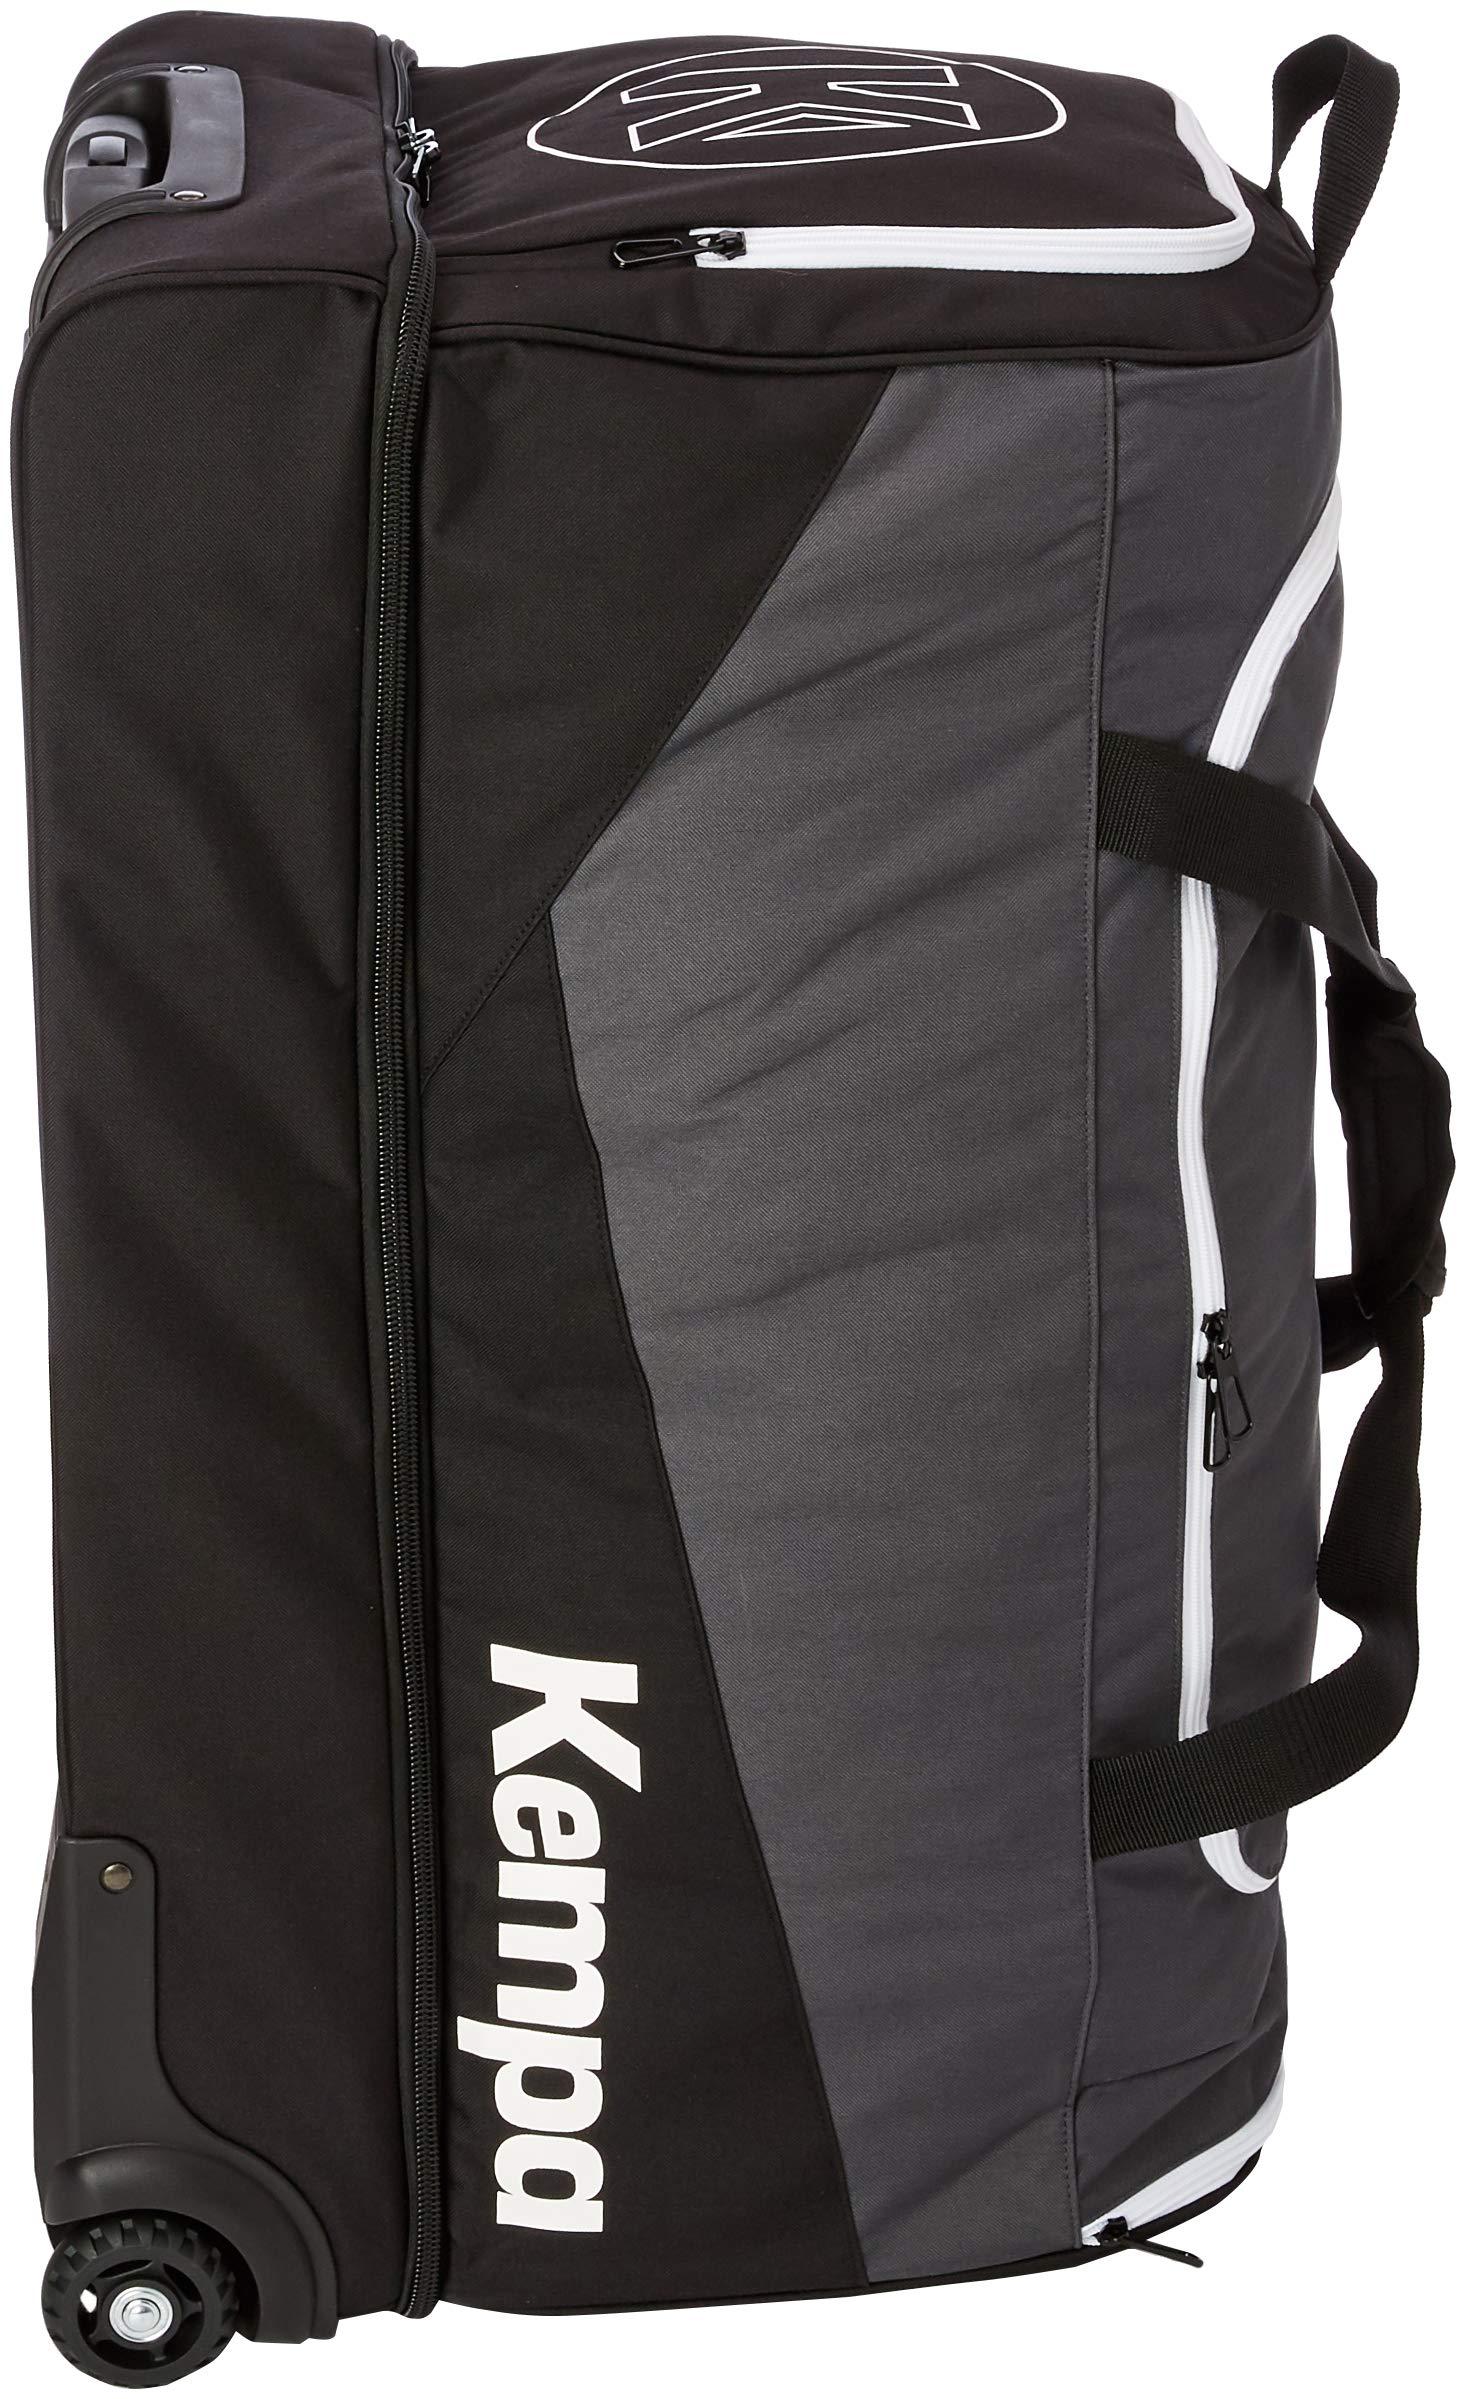 Kempa-Trolley-schwarz